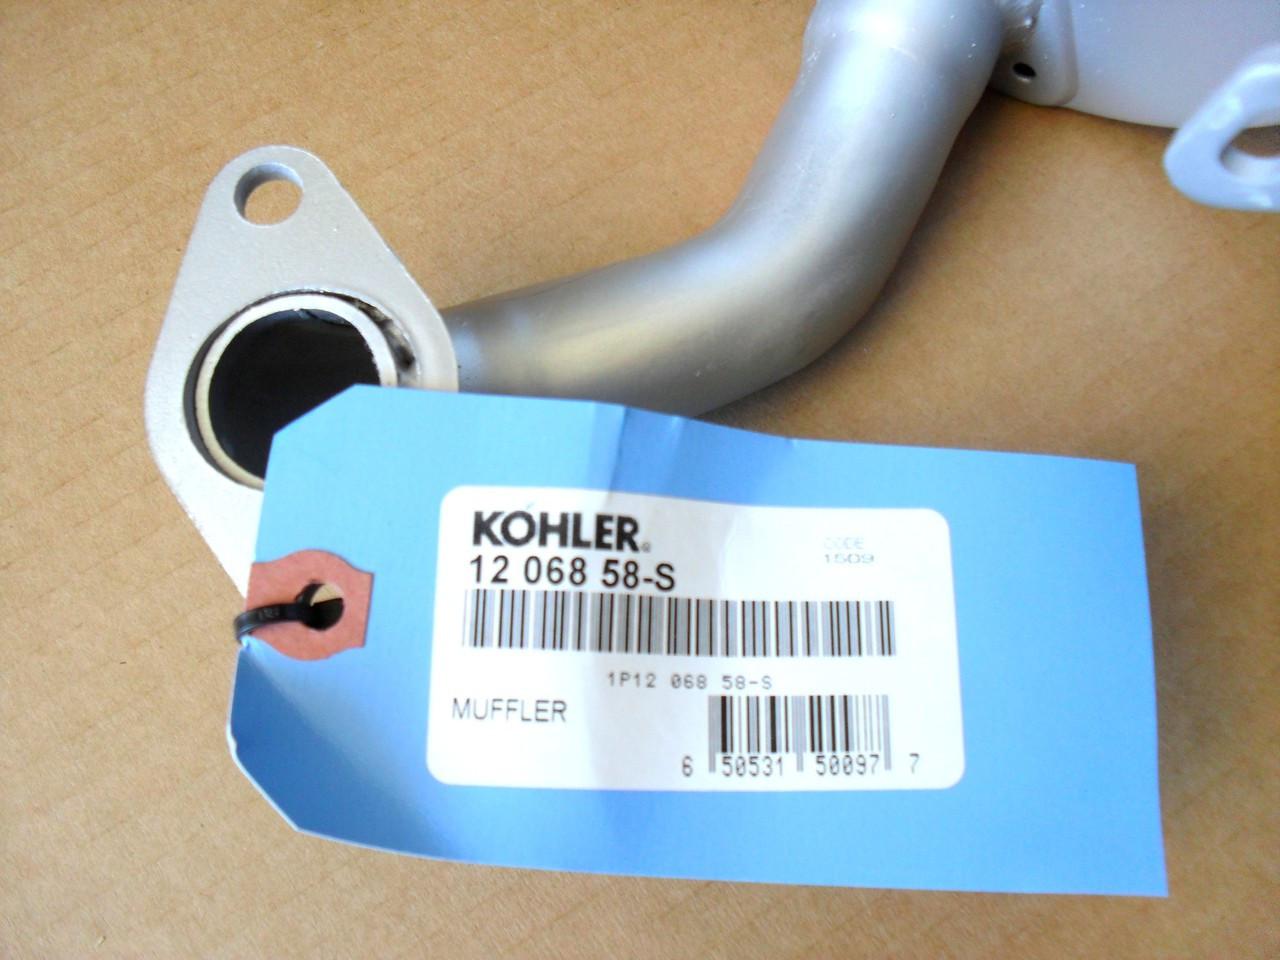 12 041 03-S OEM Kohler Exhaust Gasket 1204103S 24 041 03-S 12 068 58-S